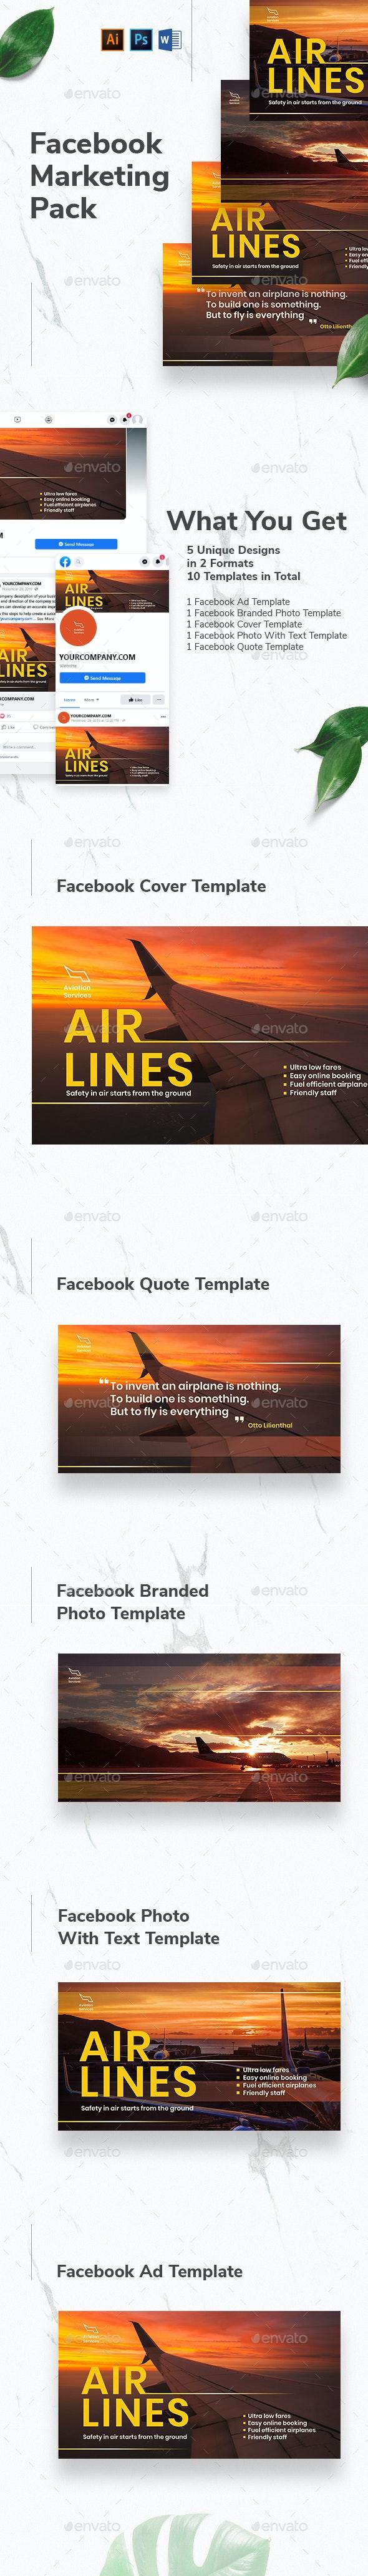 Aviation Airlines Facebook Marketing Materials - Facebook Timeline Covers Social Media